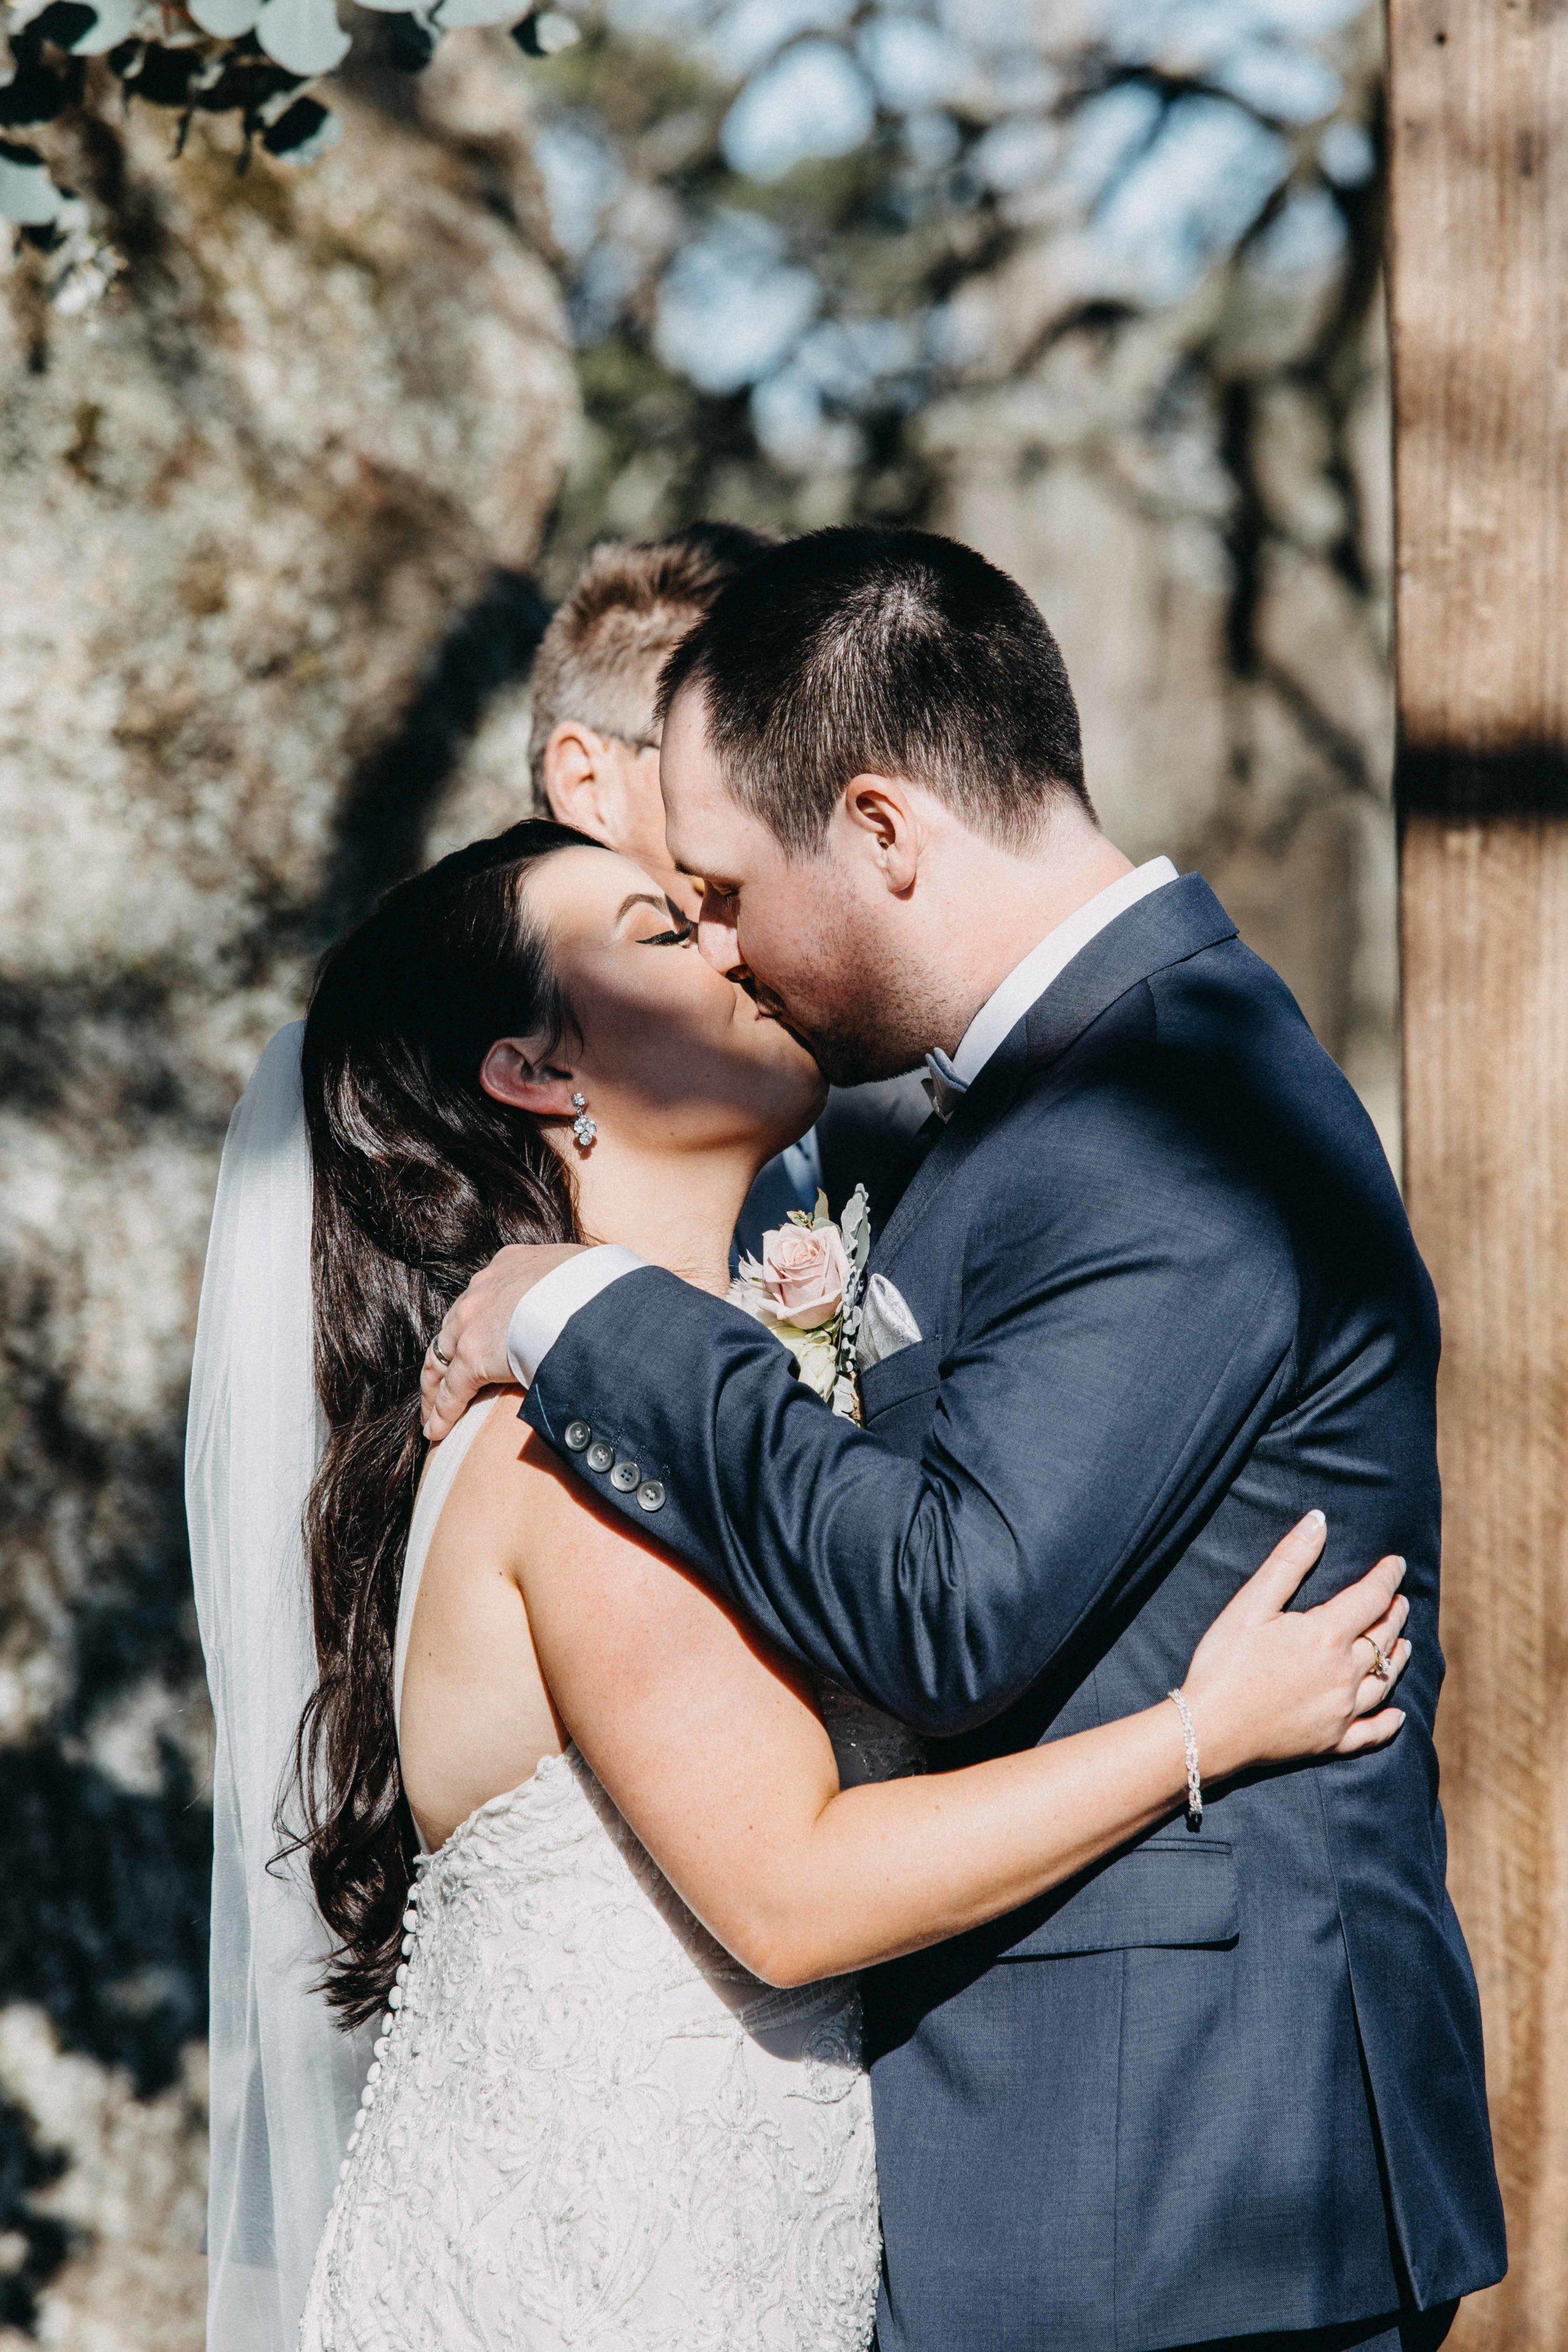 exeter-southern-highlands-wedding-www.emilyobrienphotography.net -74.jpg